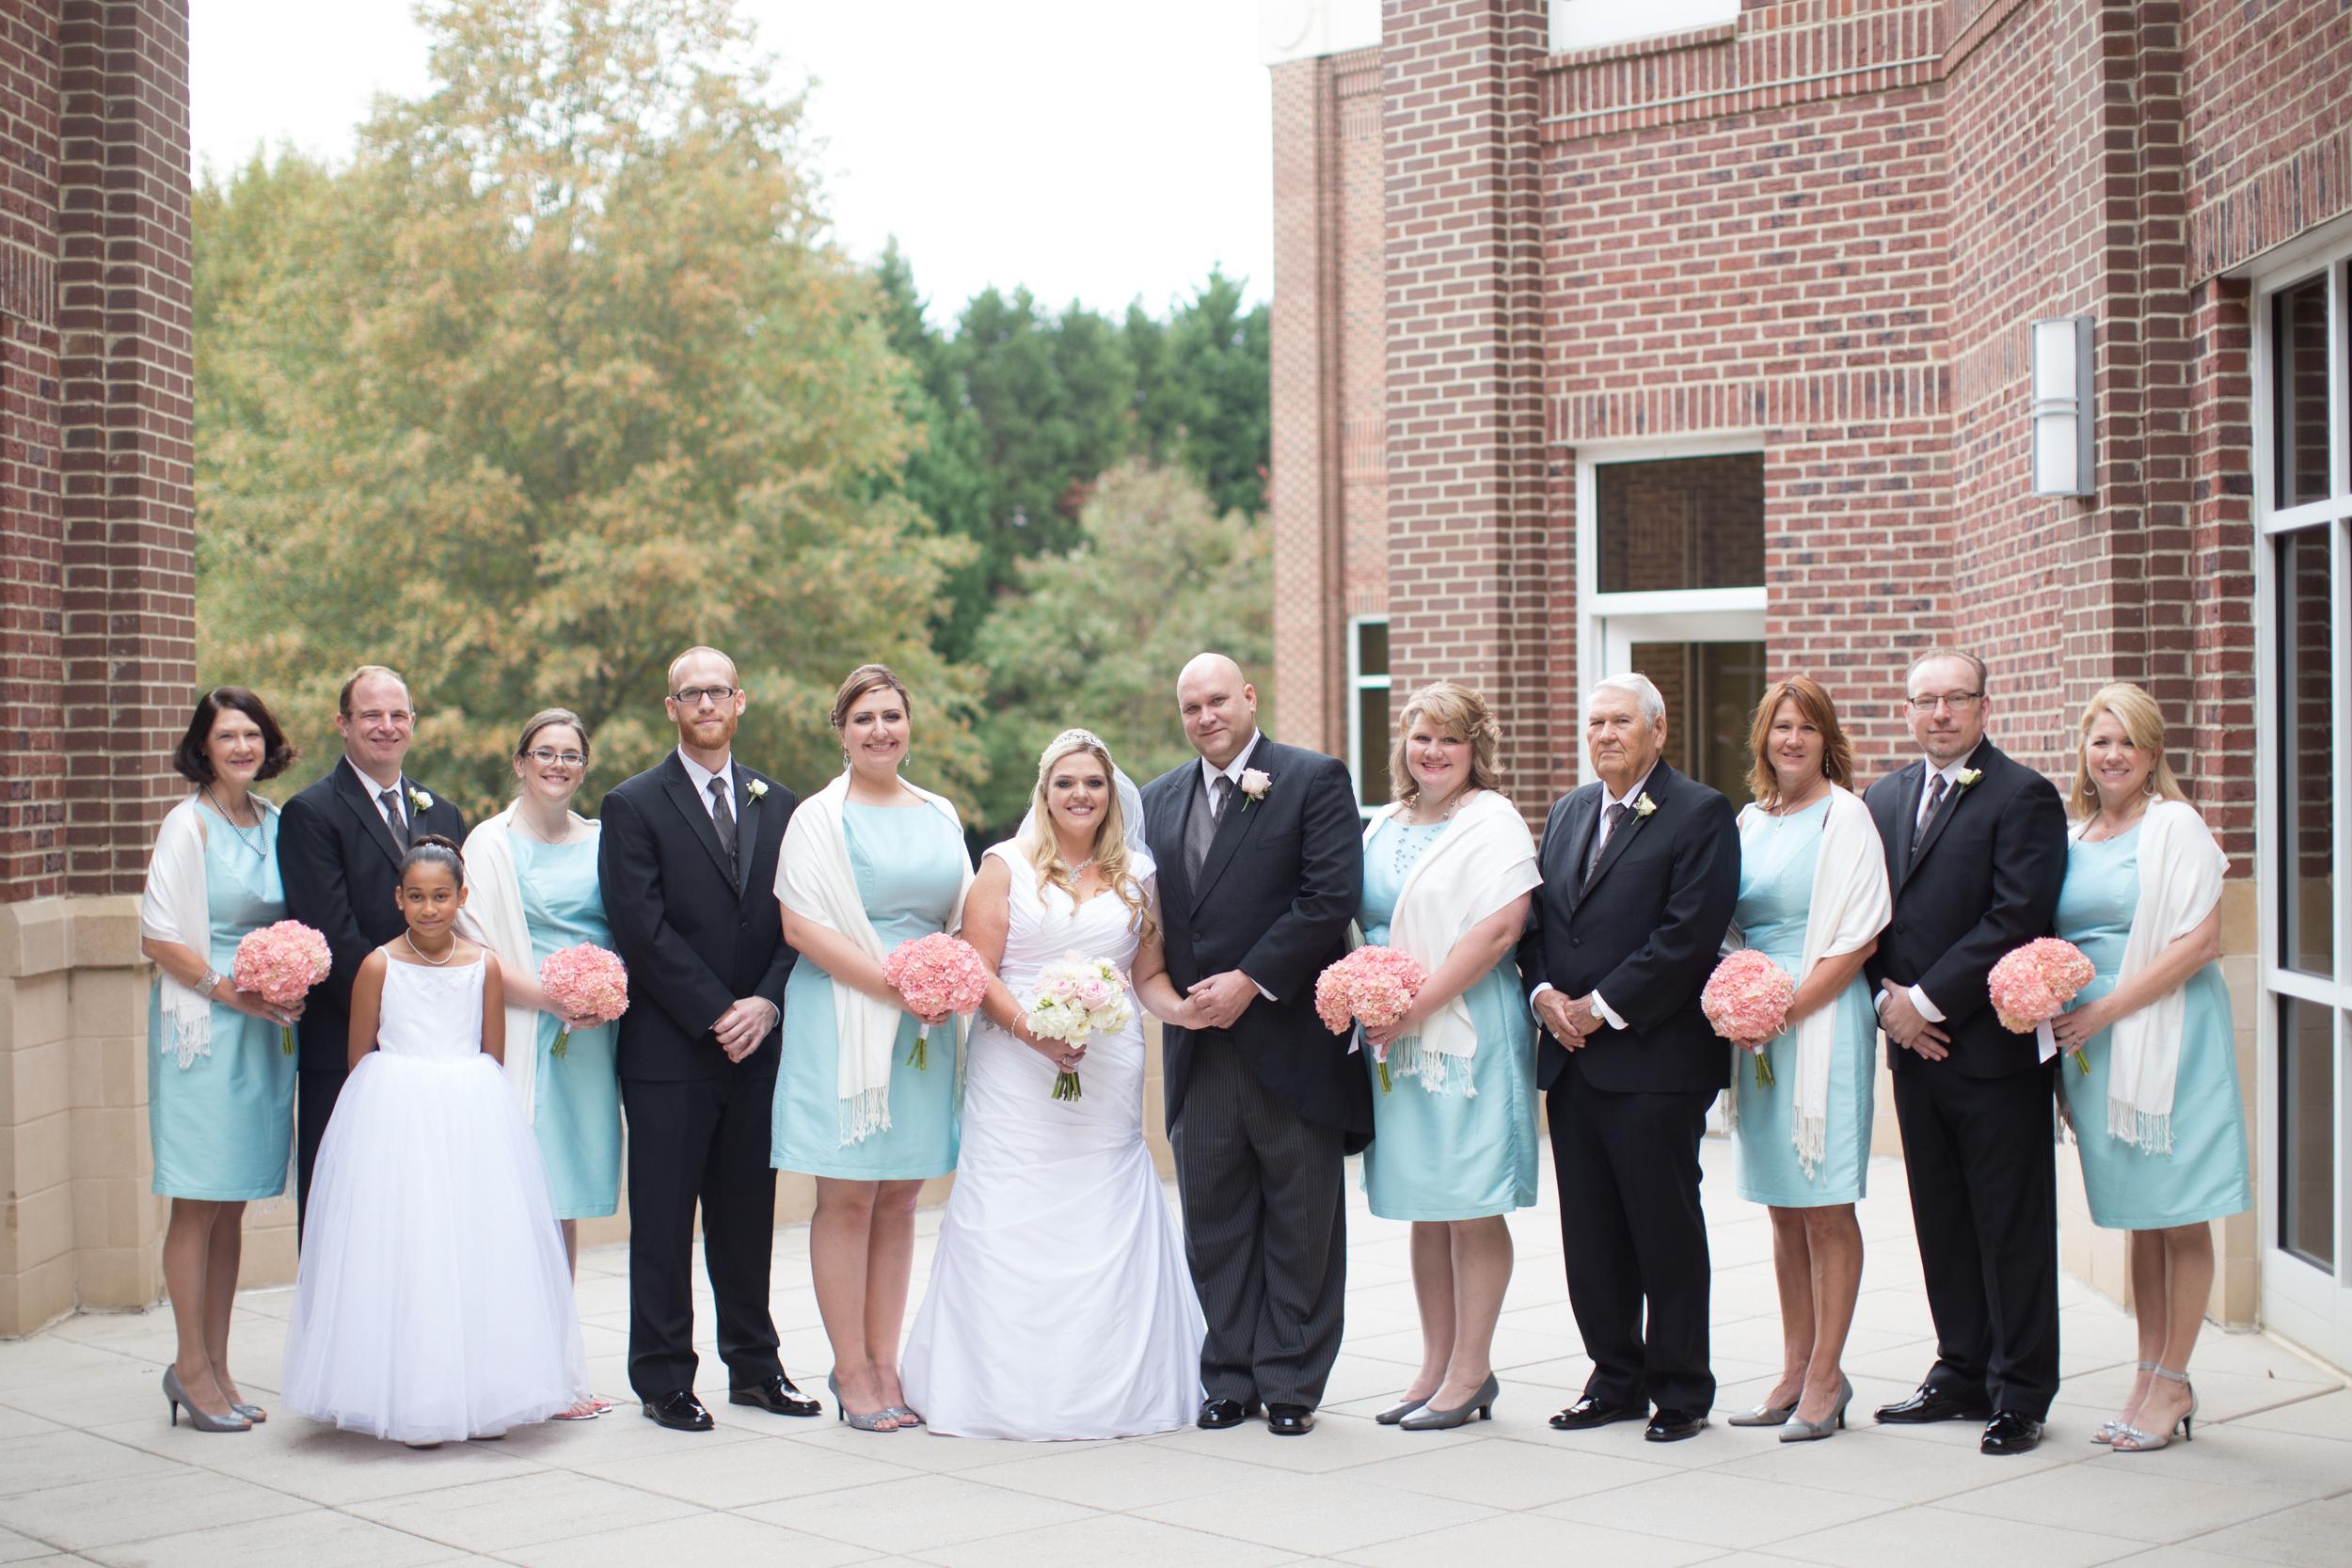 Hough_Wedding_North_Carolina_Charlotte_JonCourvillePhotography-333.jpg